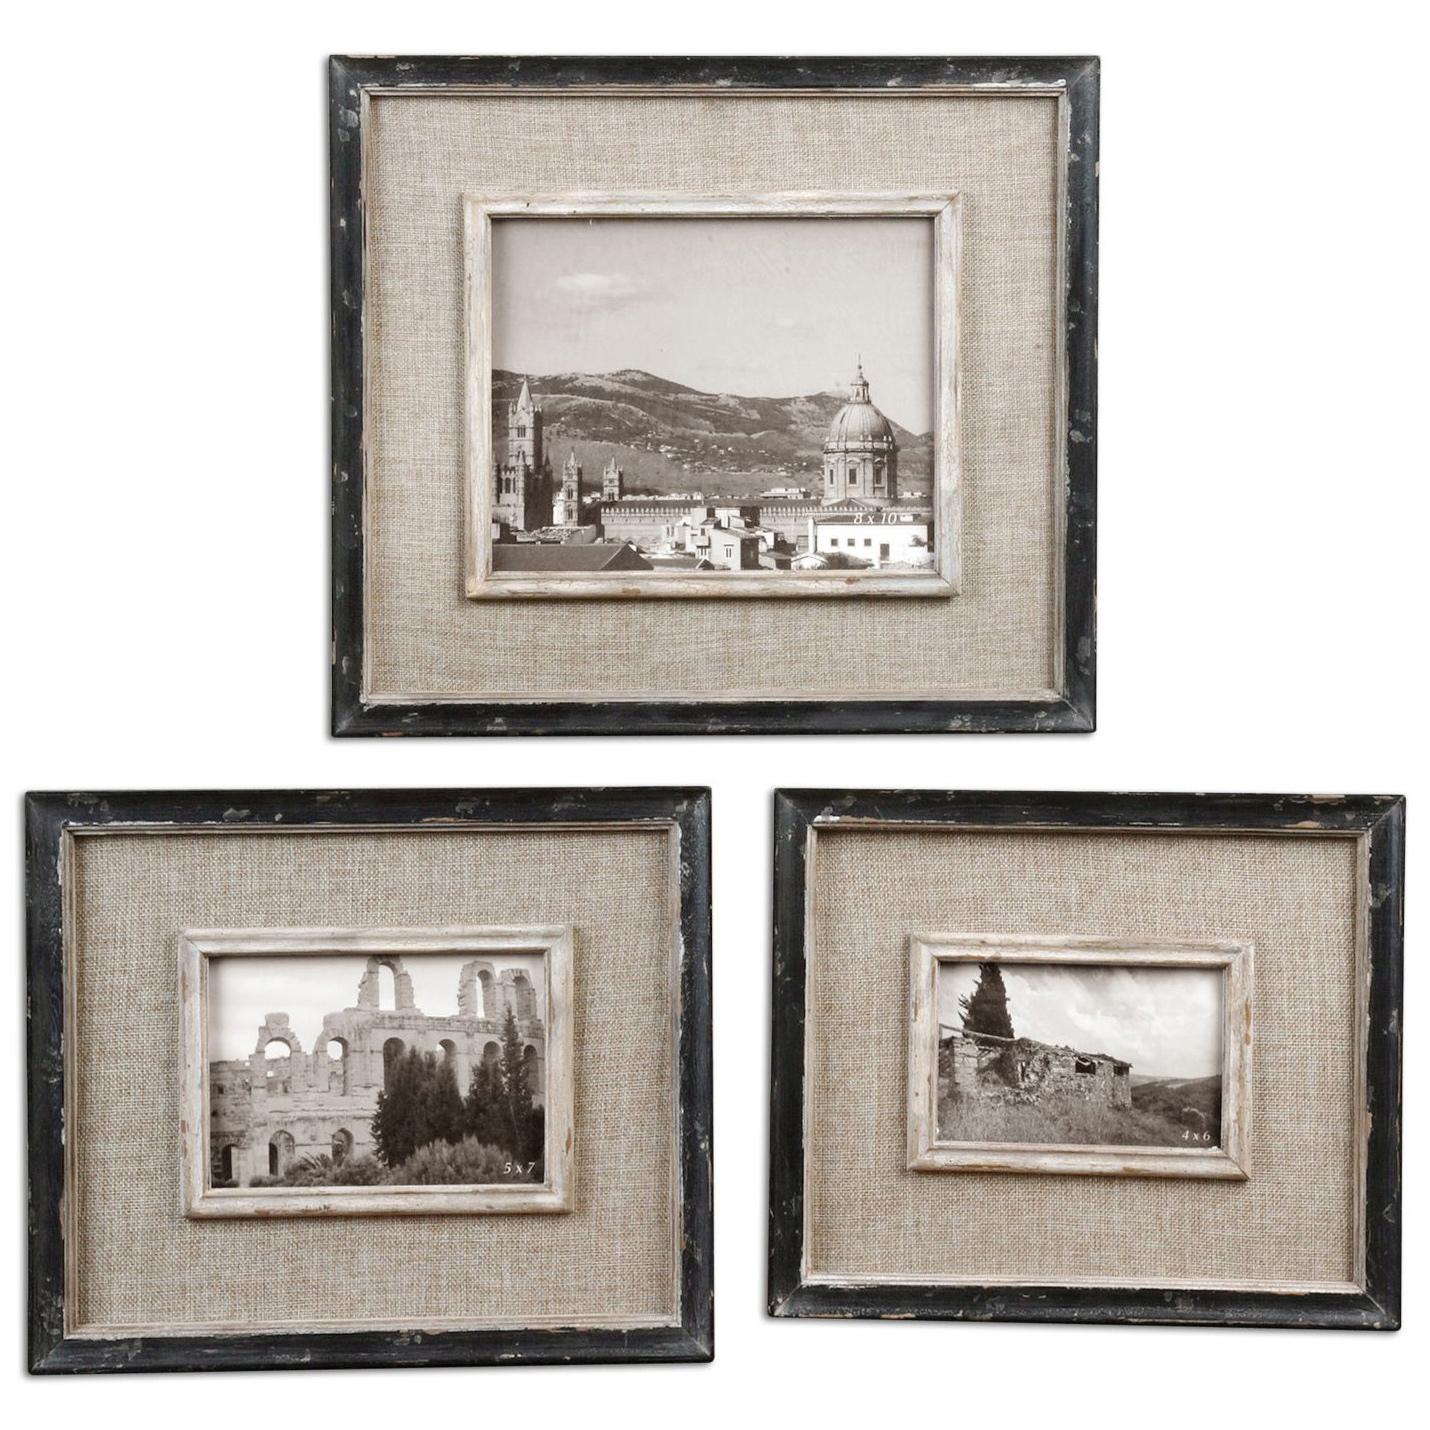 Designer photo frames eclectic photo frames kathy kuo home ashe rustic lodge black burlap wood photo frames set of 3 jeuxipadfo Image collections